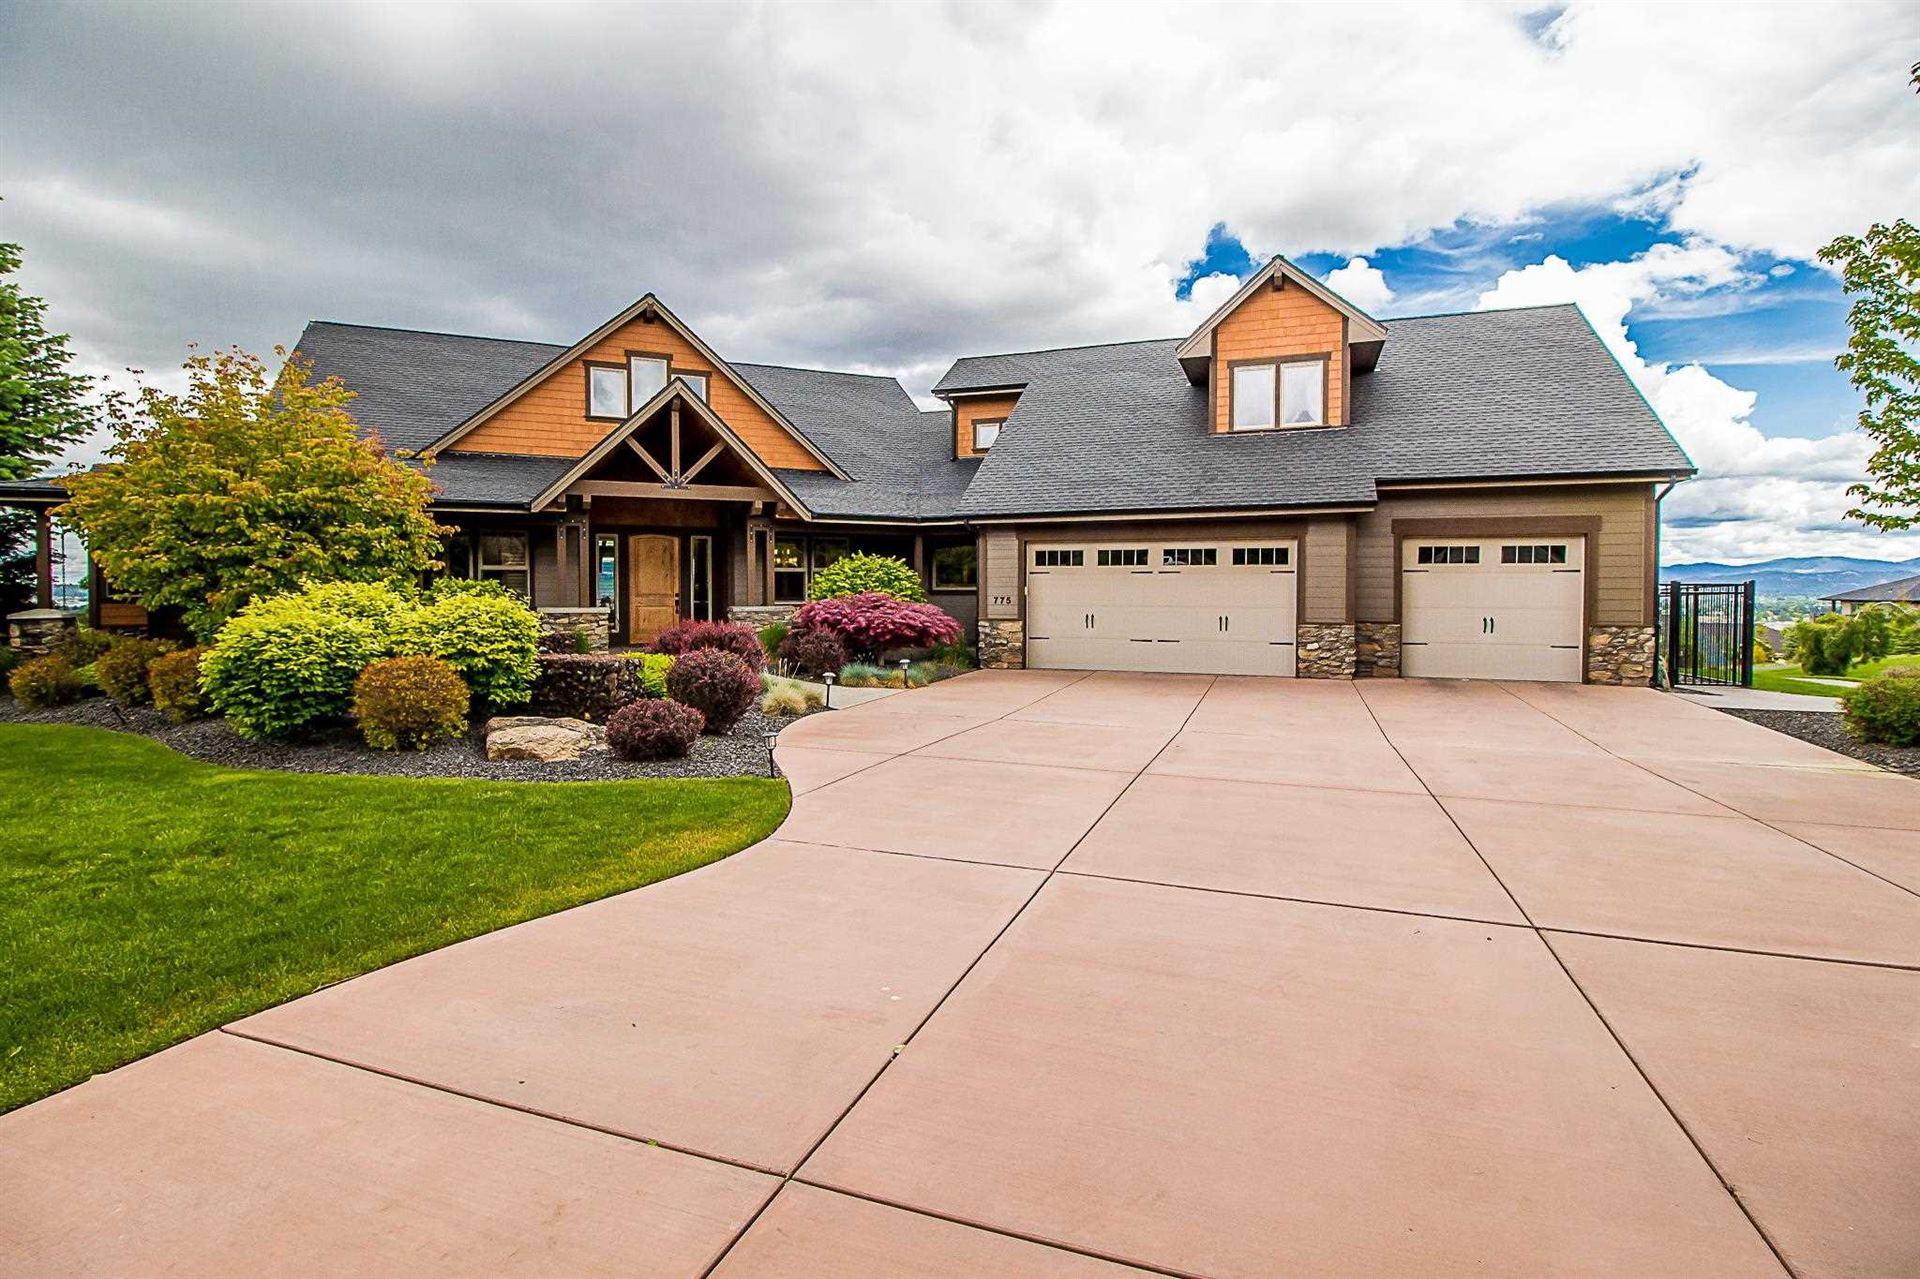 775 N Holiday Hills Dr, Liberty Lake, WA 99019 - #: 202116207